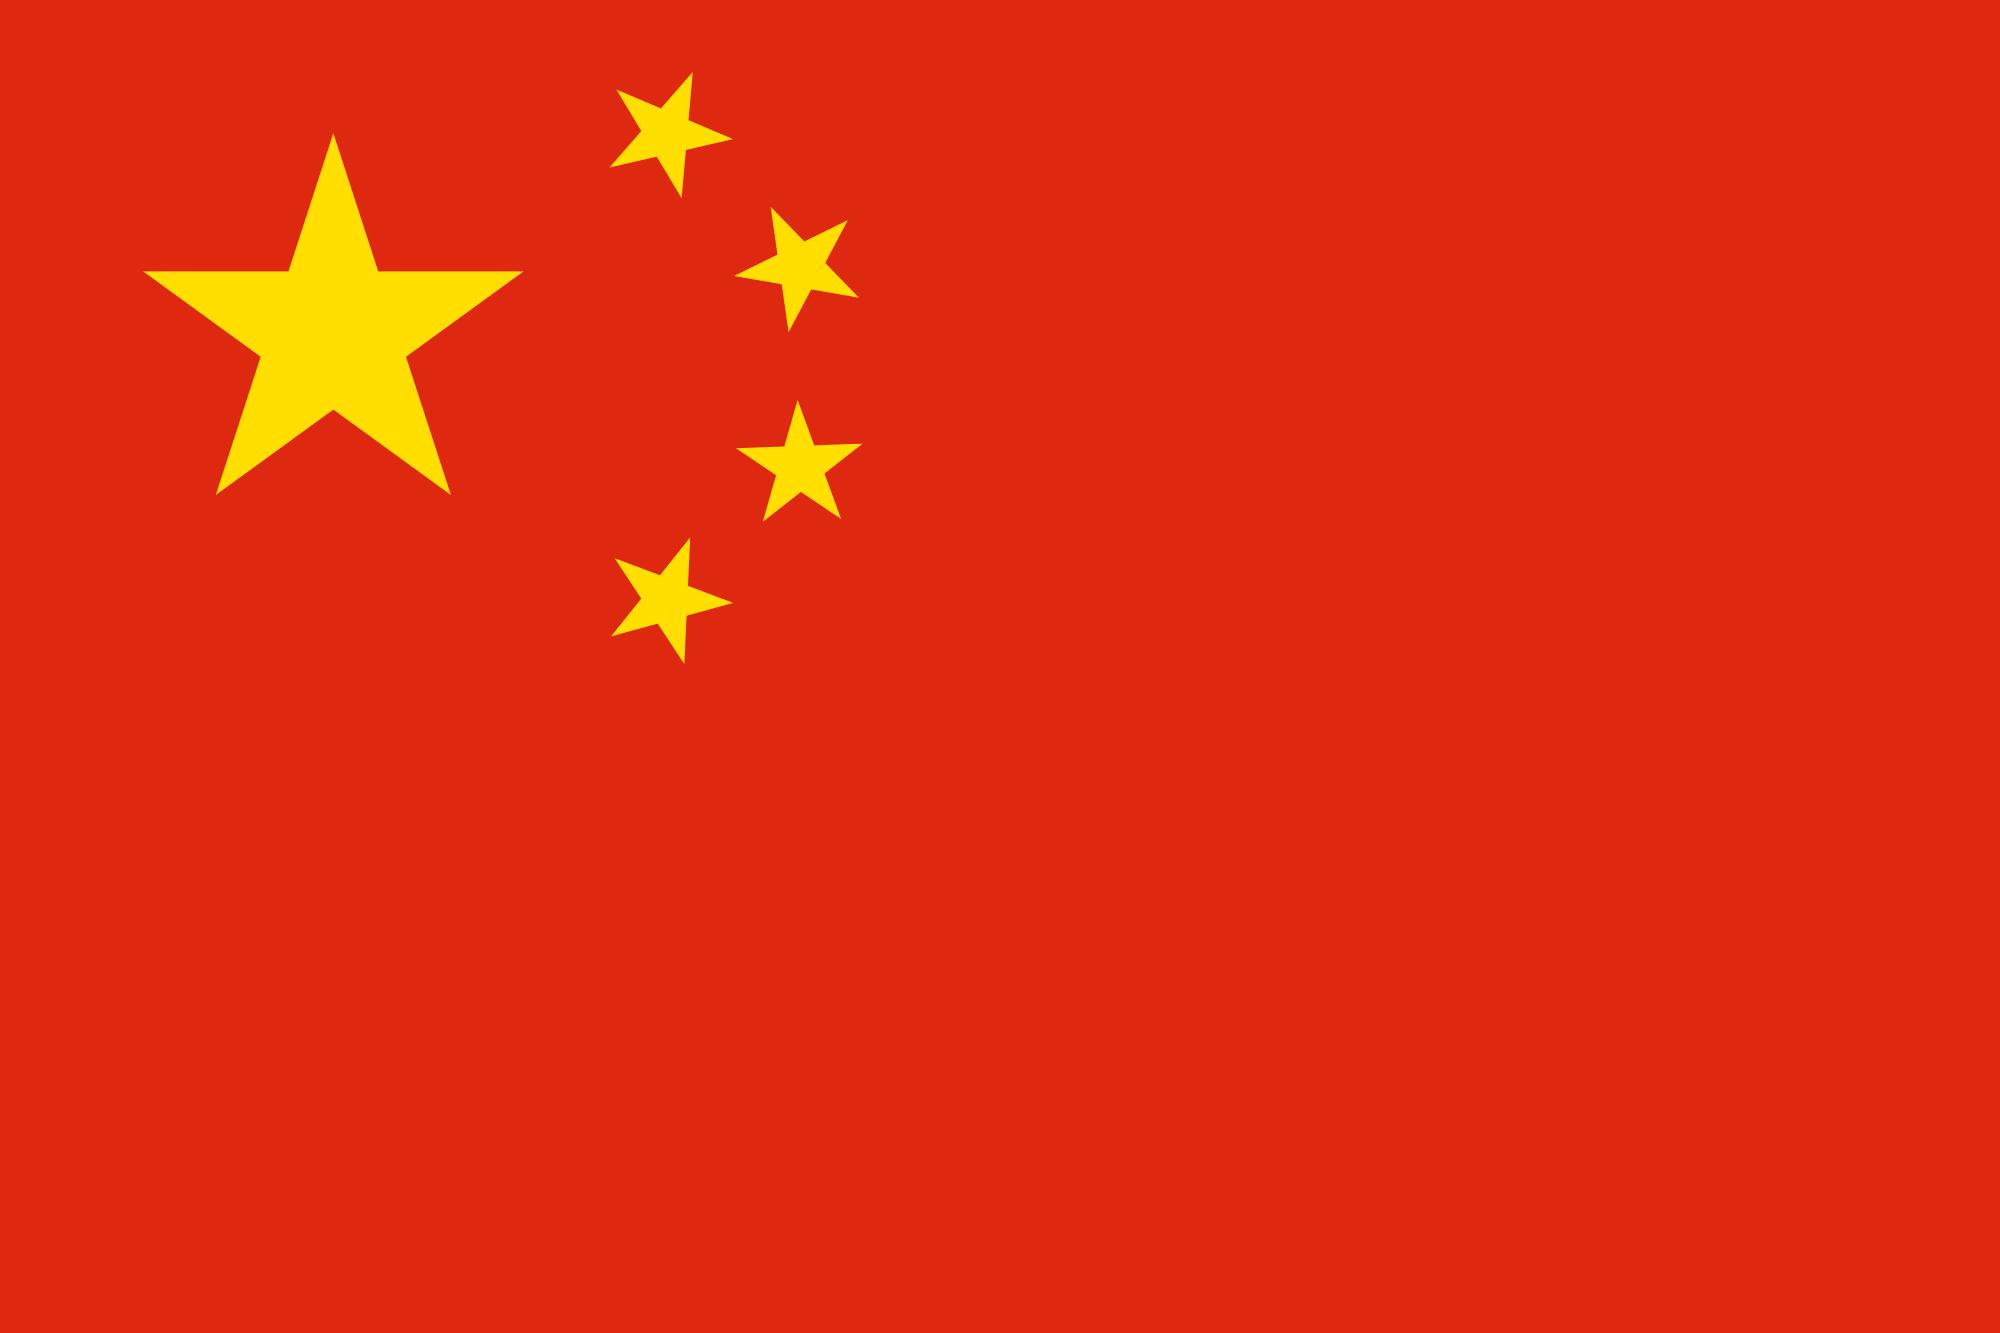 Dragon - China culture